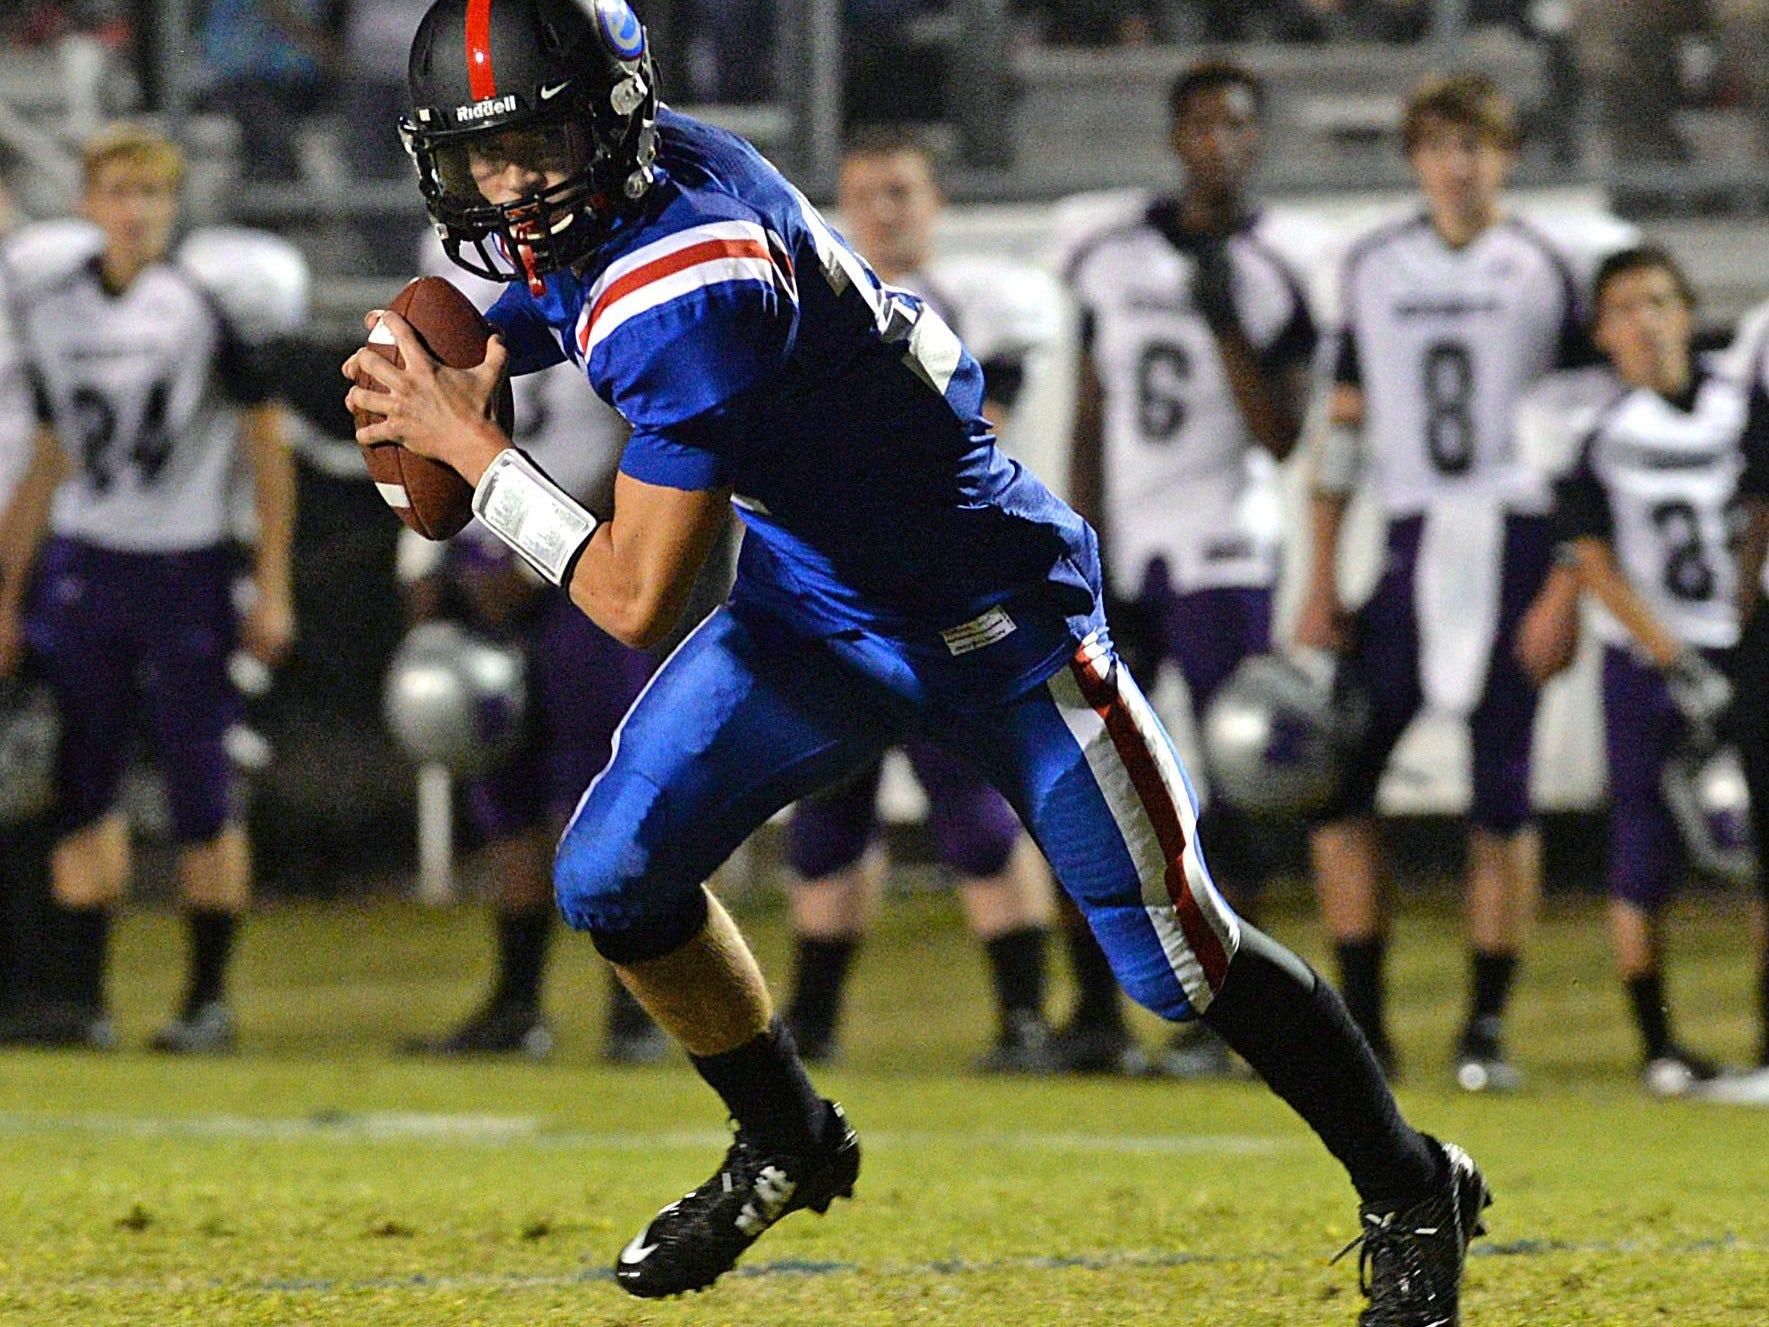 Evangel quarterback Connor Curry threw four touchdown passe